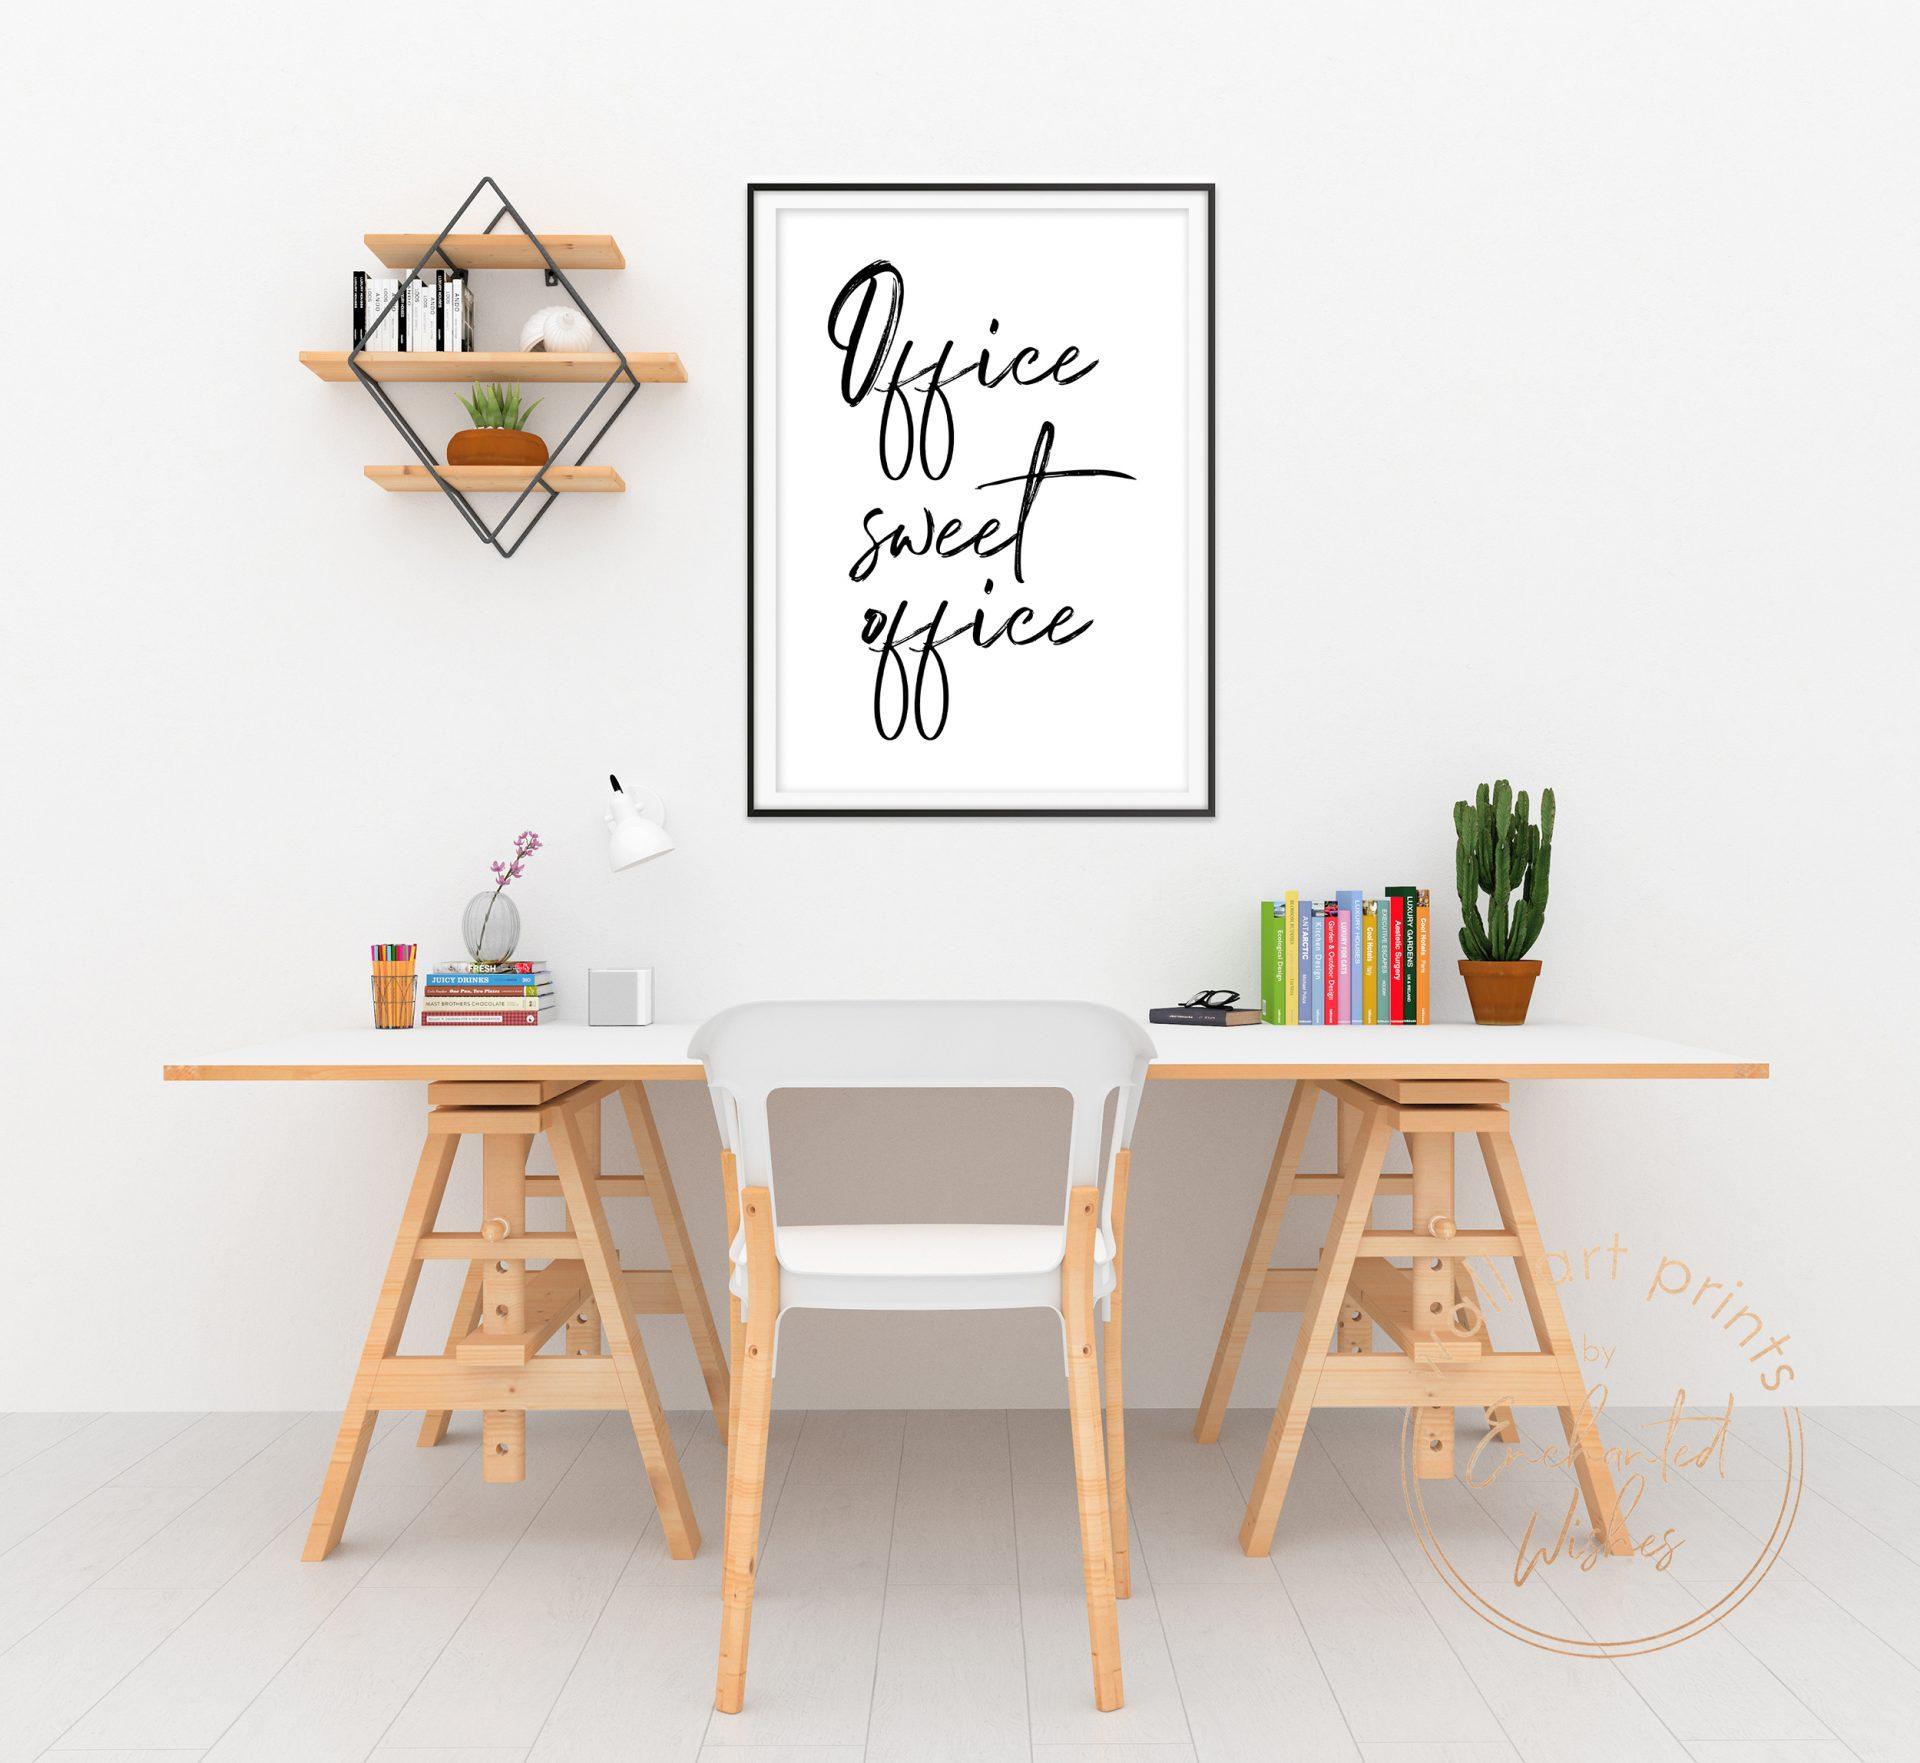 Office sweet office printable